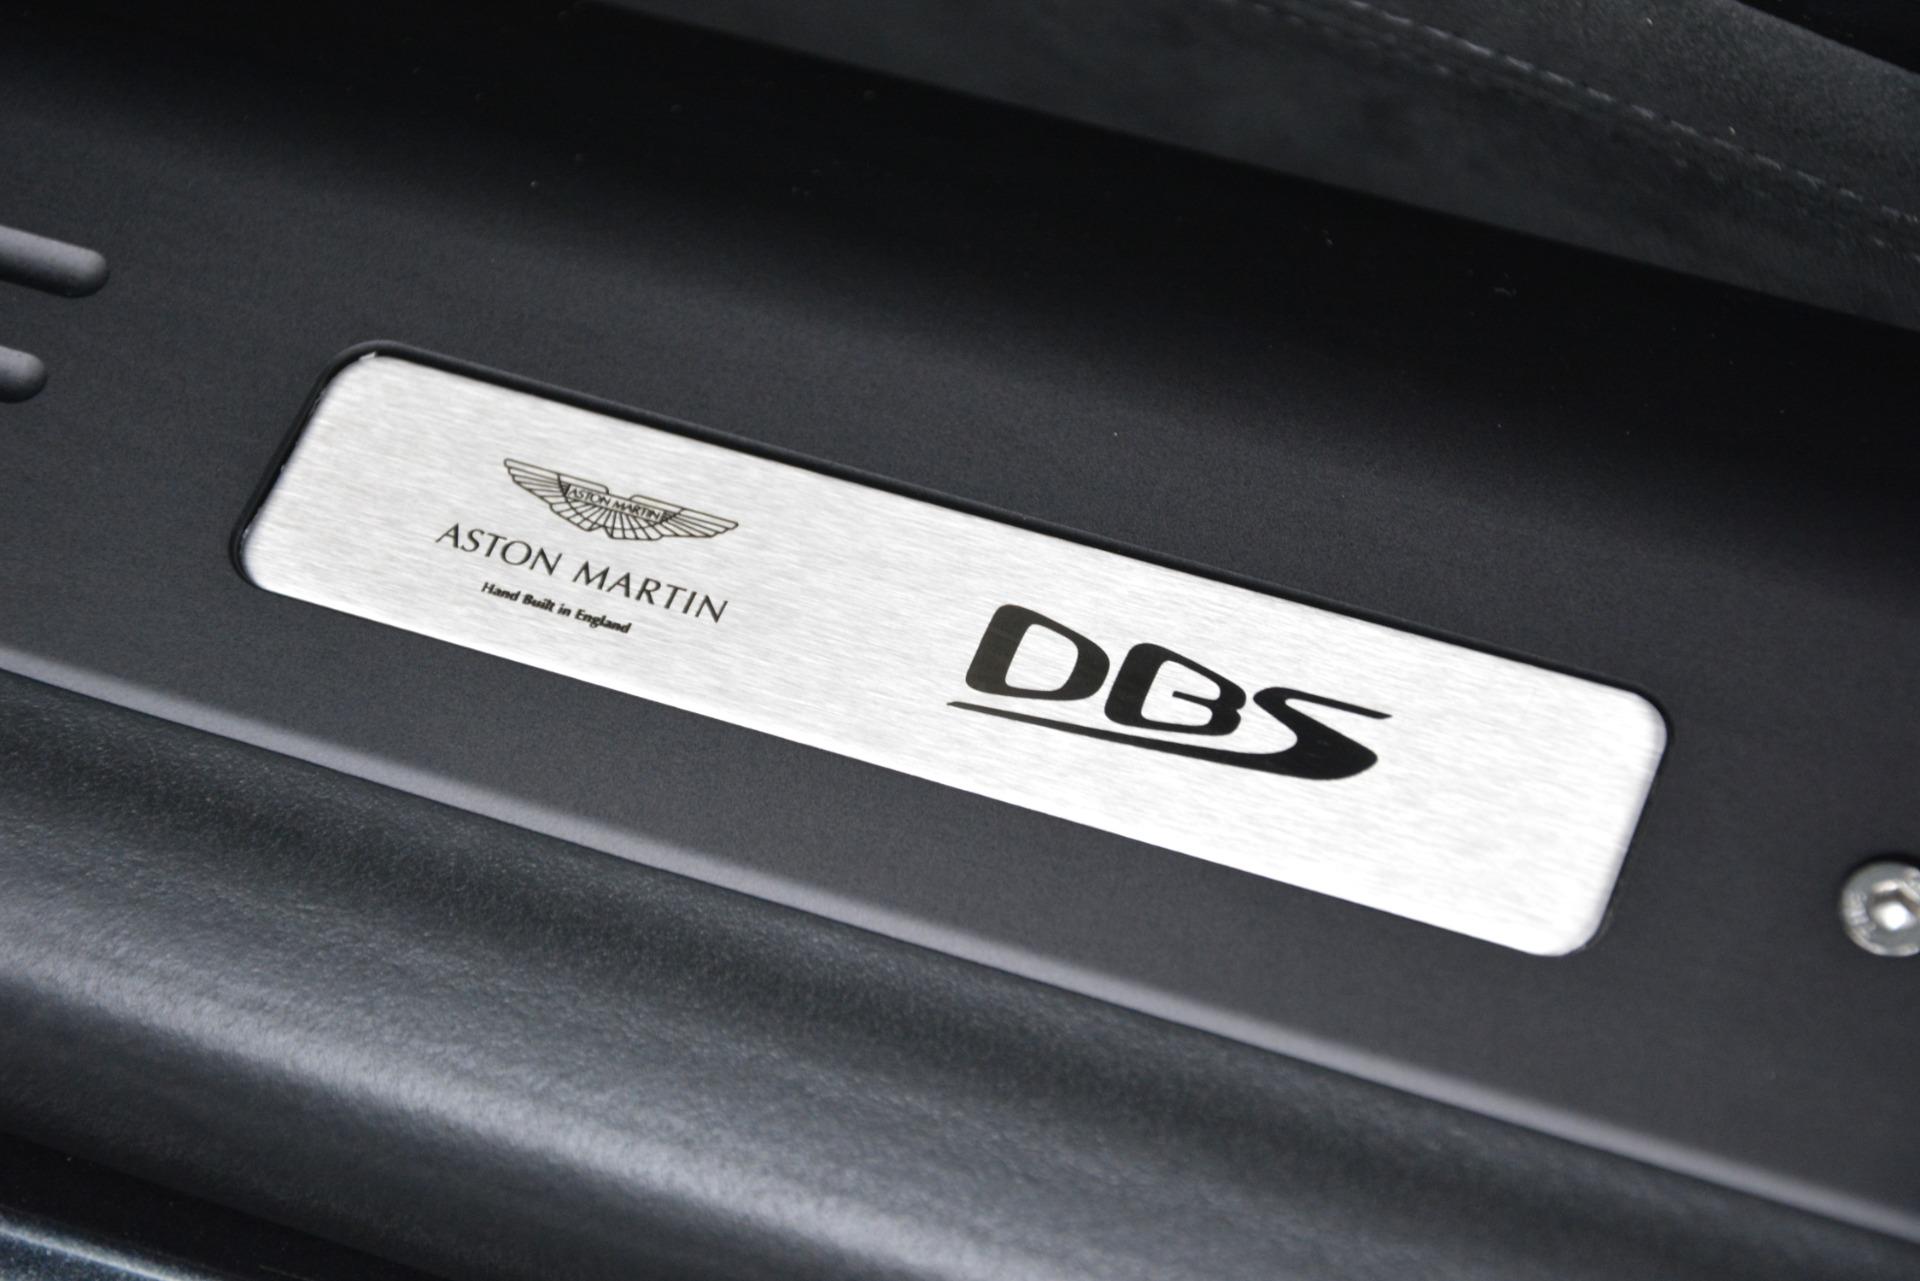 New 2019 Aston Martin DBS Superleggera For Sale In Westport, CT 3318_p20